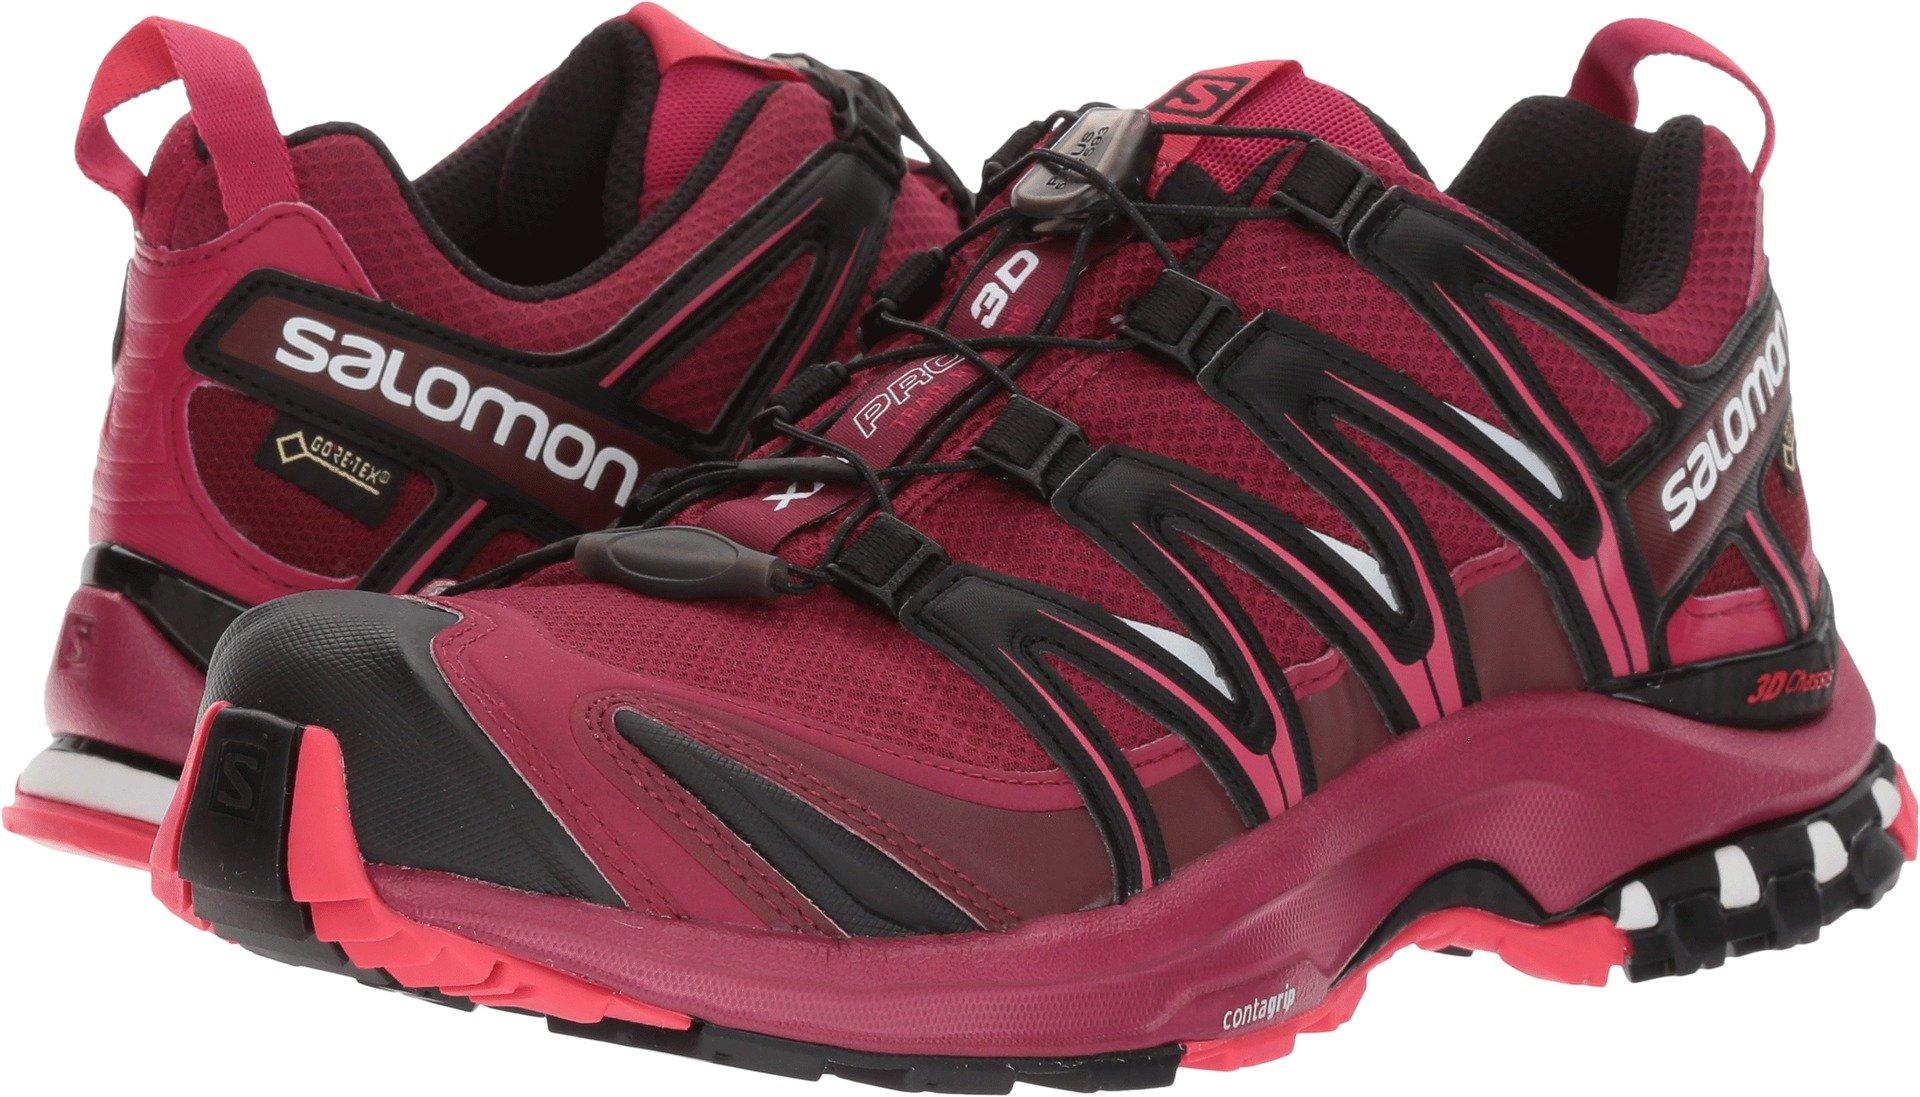 Salomon Women's XA PRO 3D GTX Beet Red/Sangria/Black Athletic Shoe